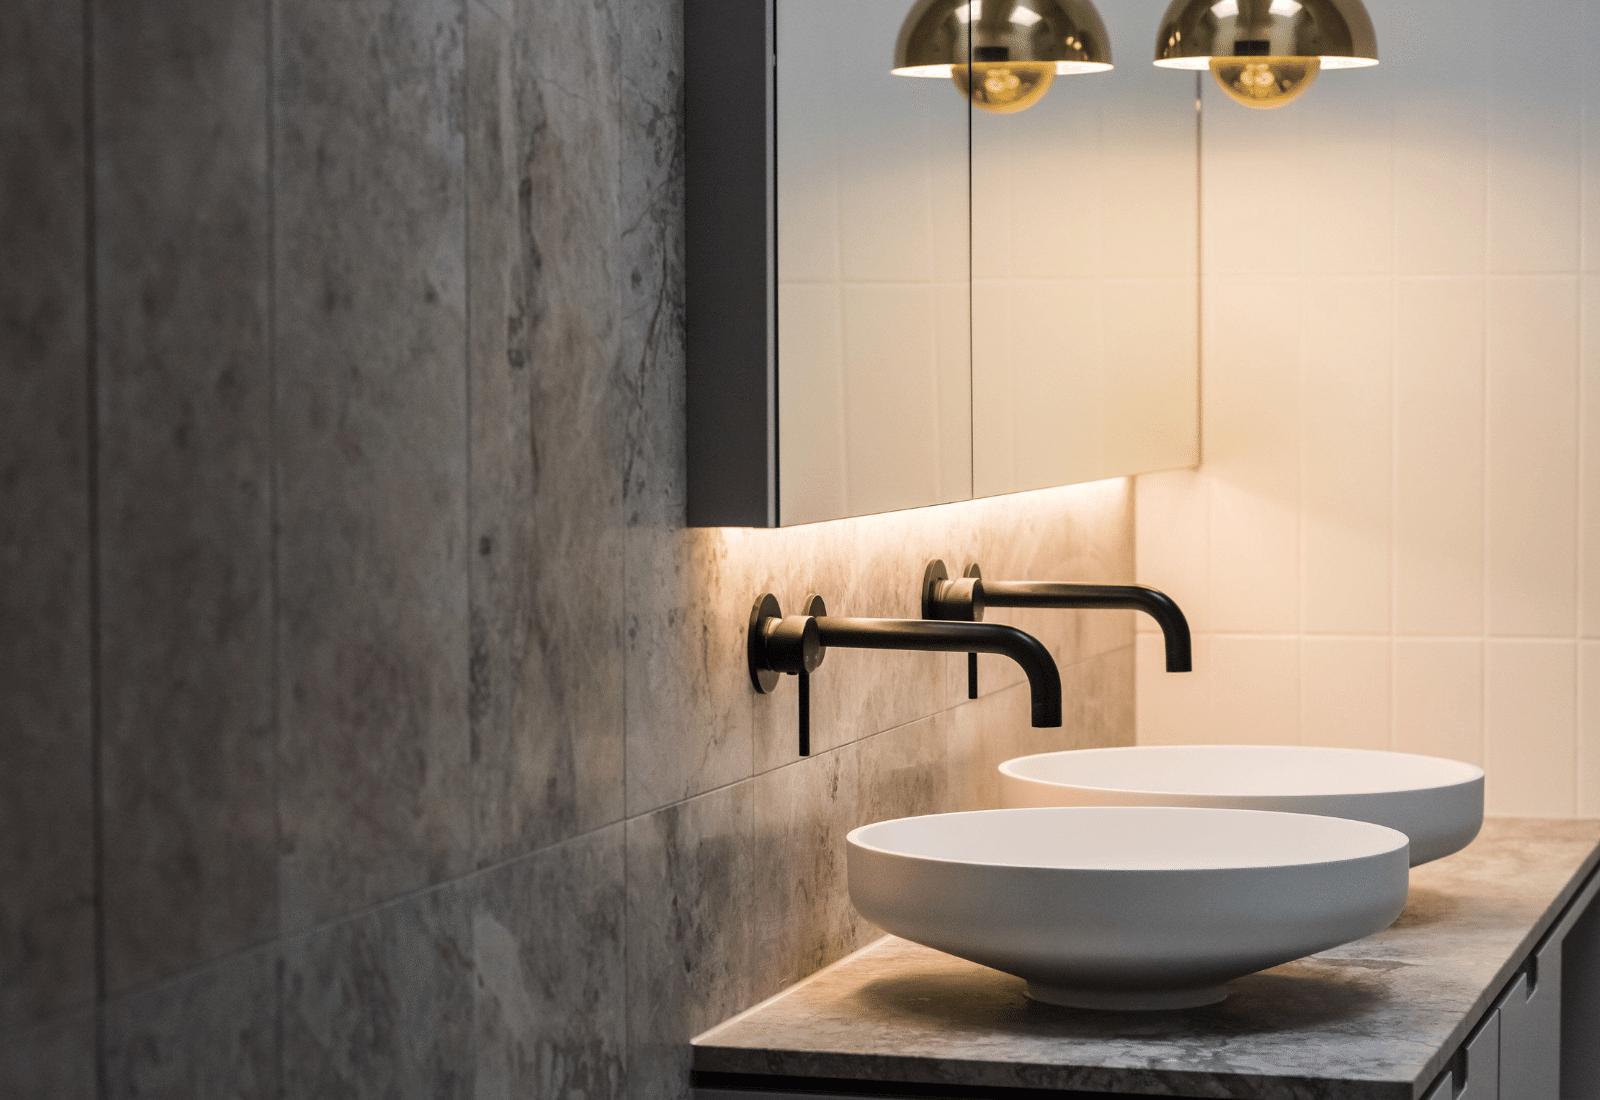 Bathroom Renovation Supplies Melbourne